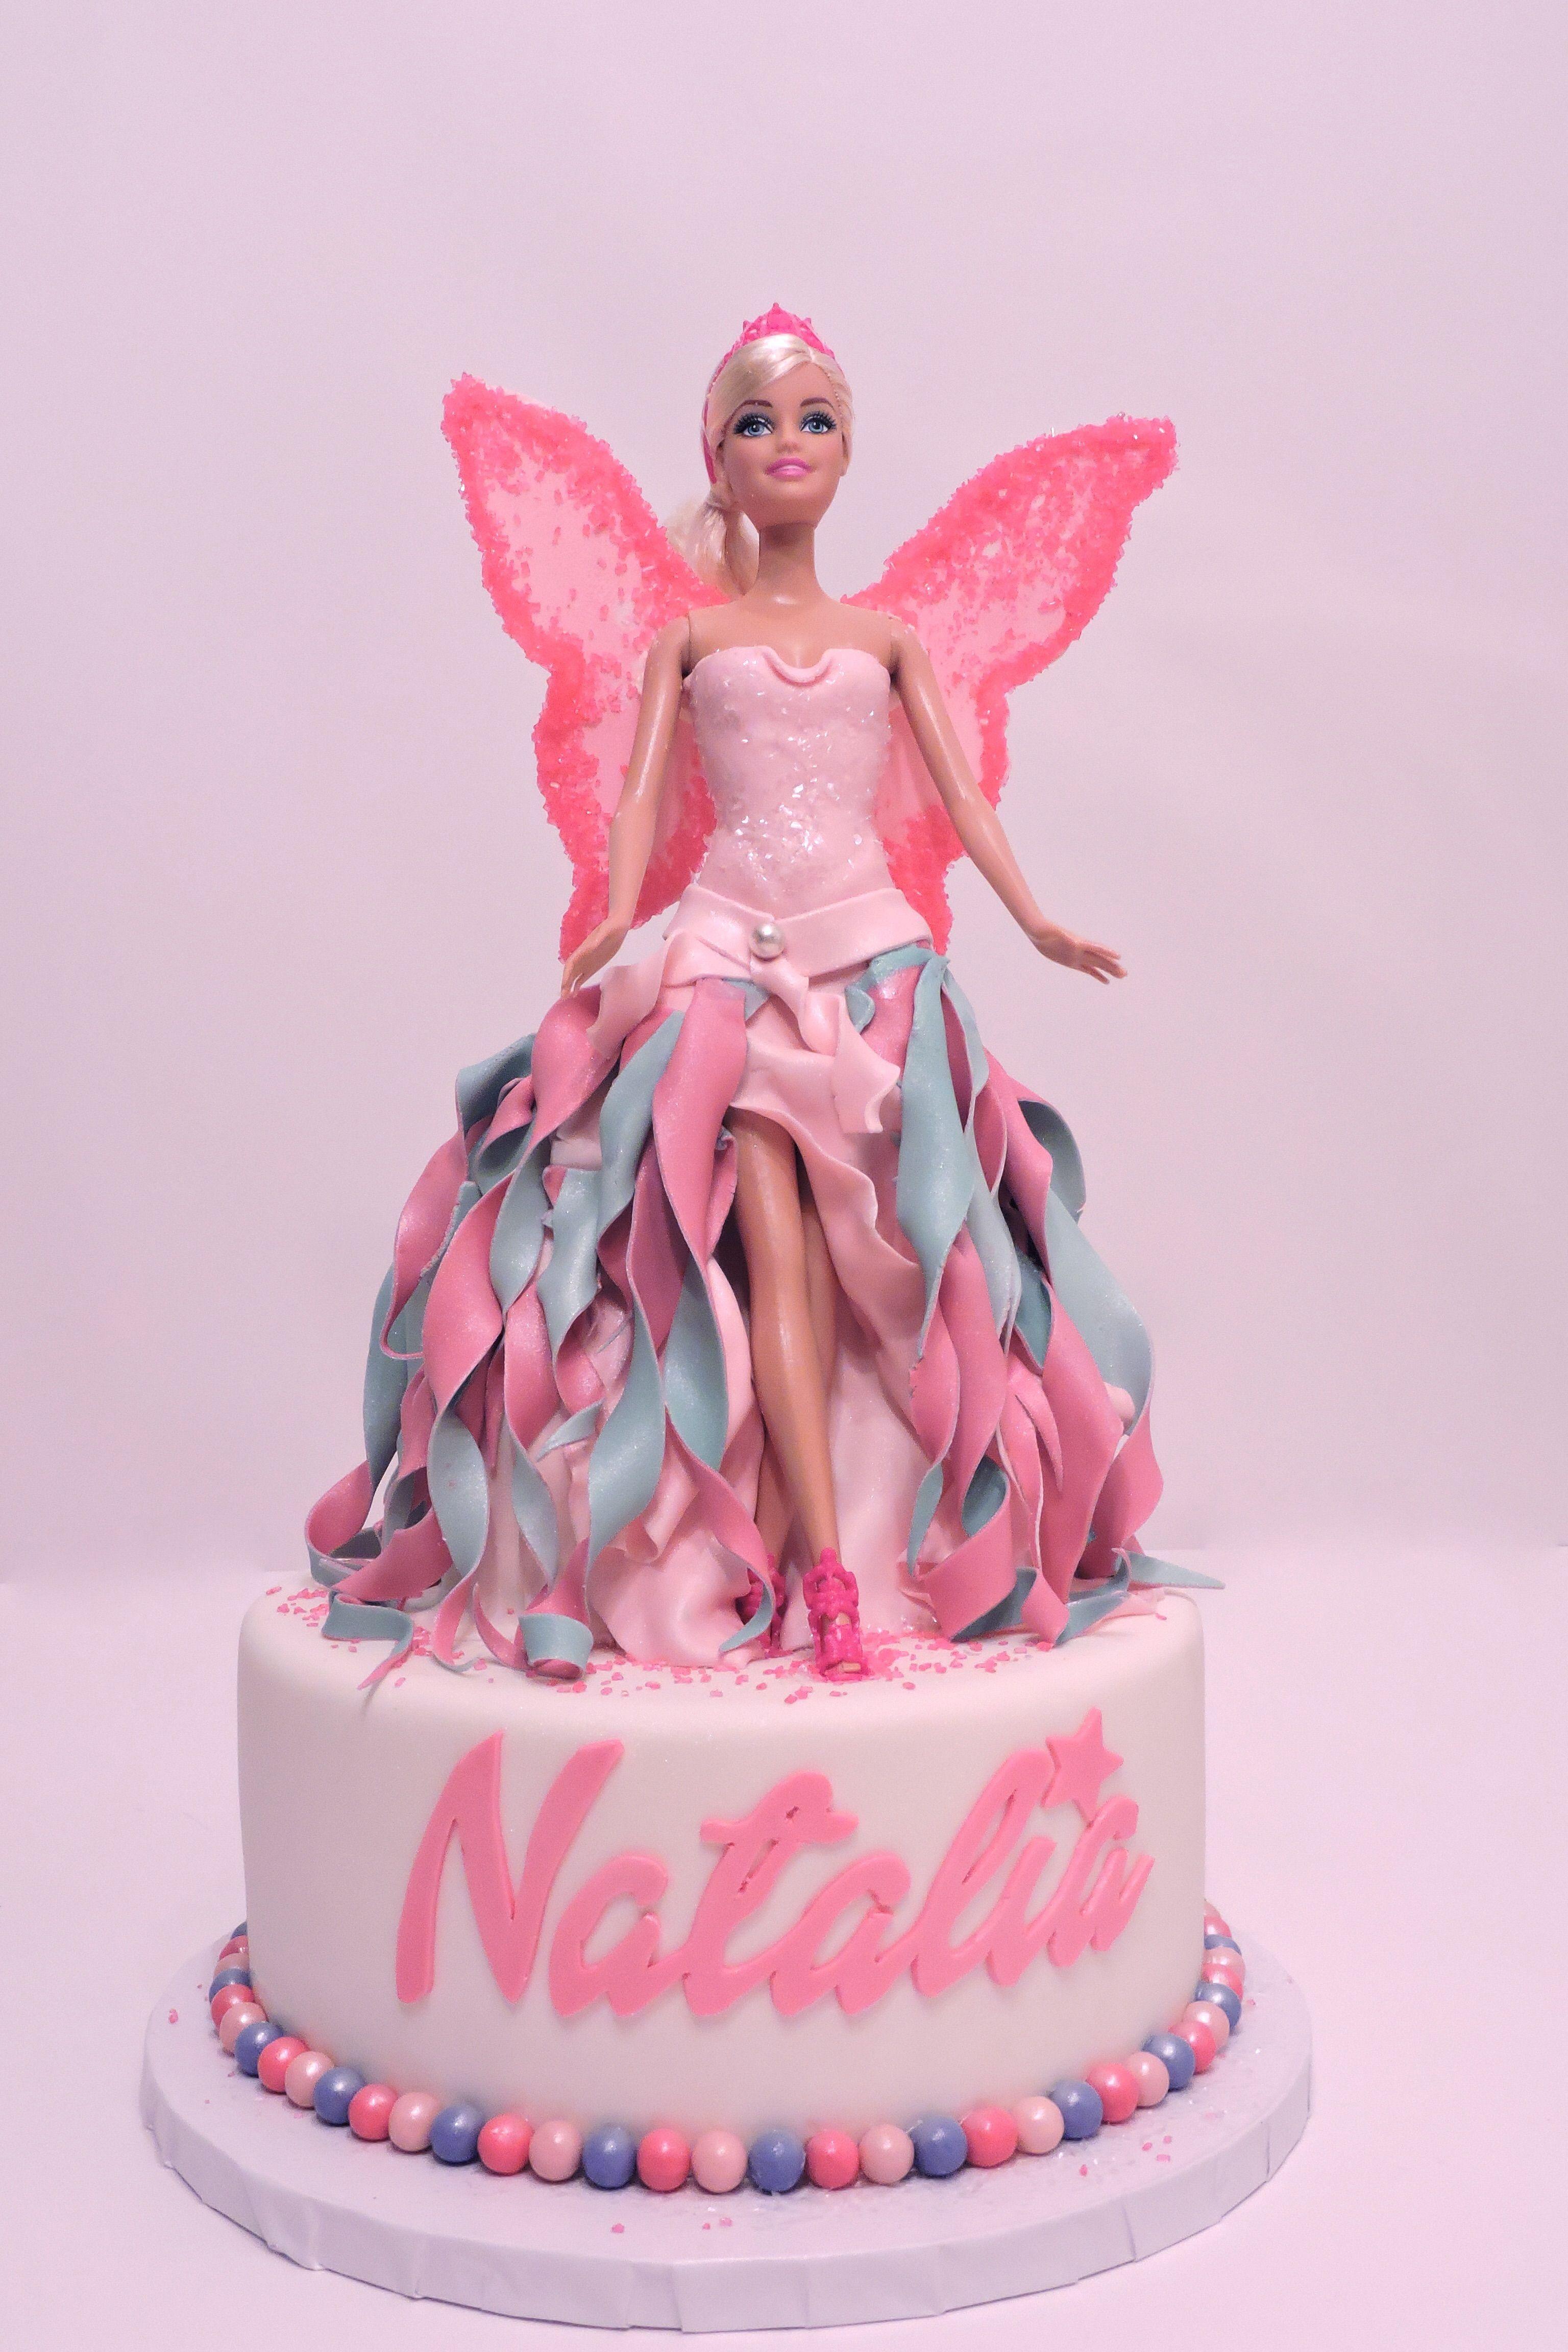 Barbie Fairy Cake With Images Barbie Birthday Cake Barbie